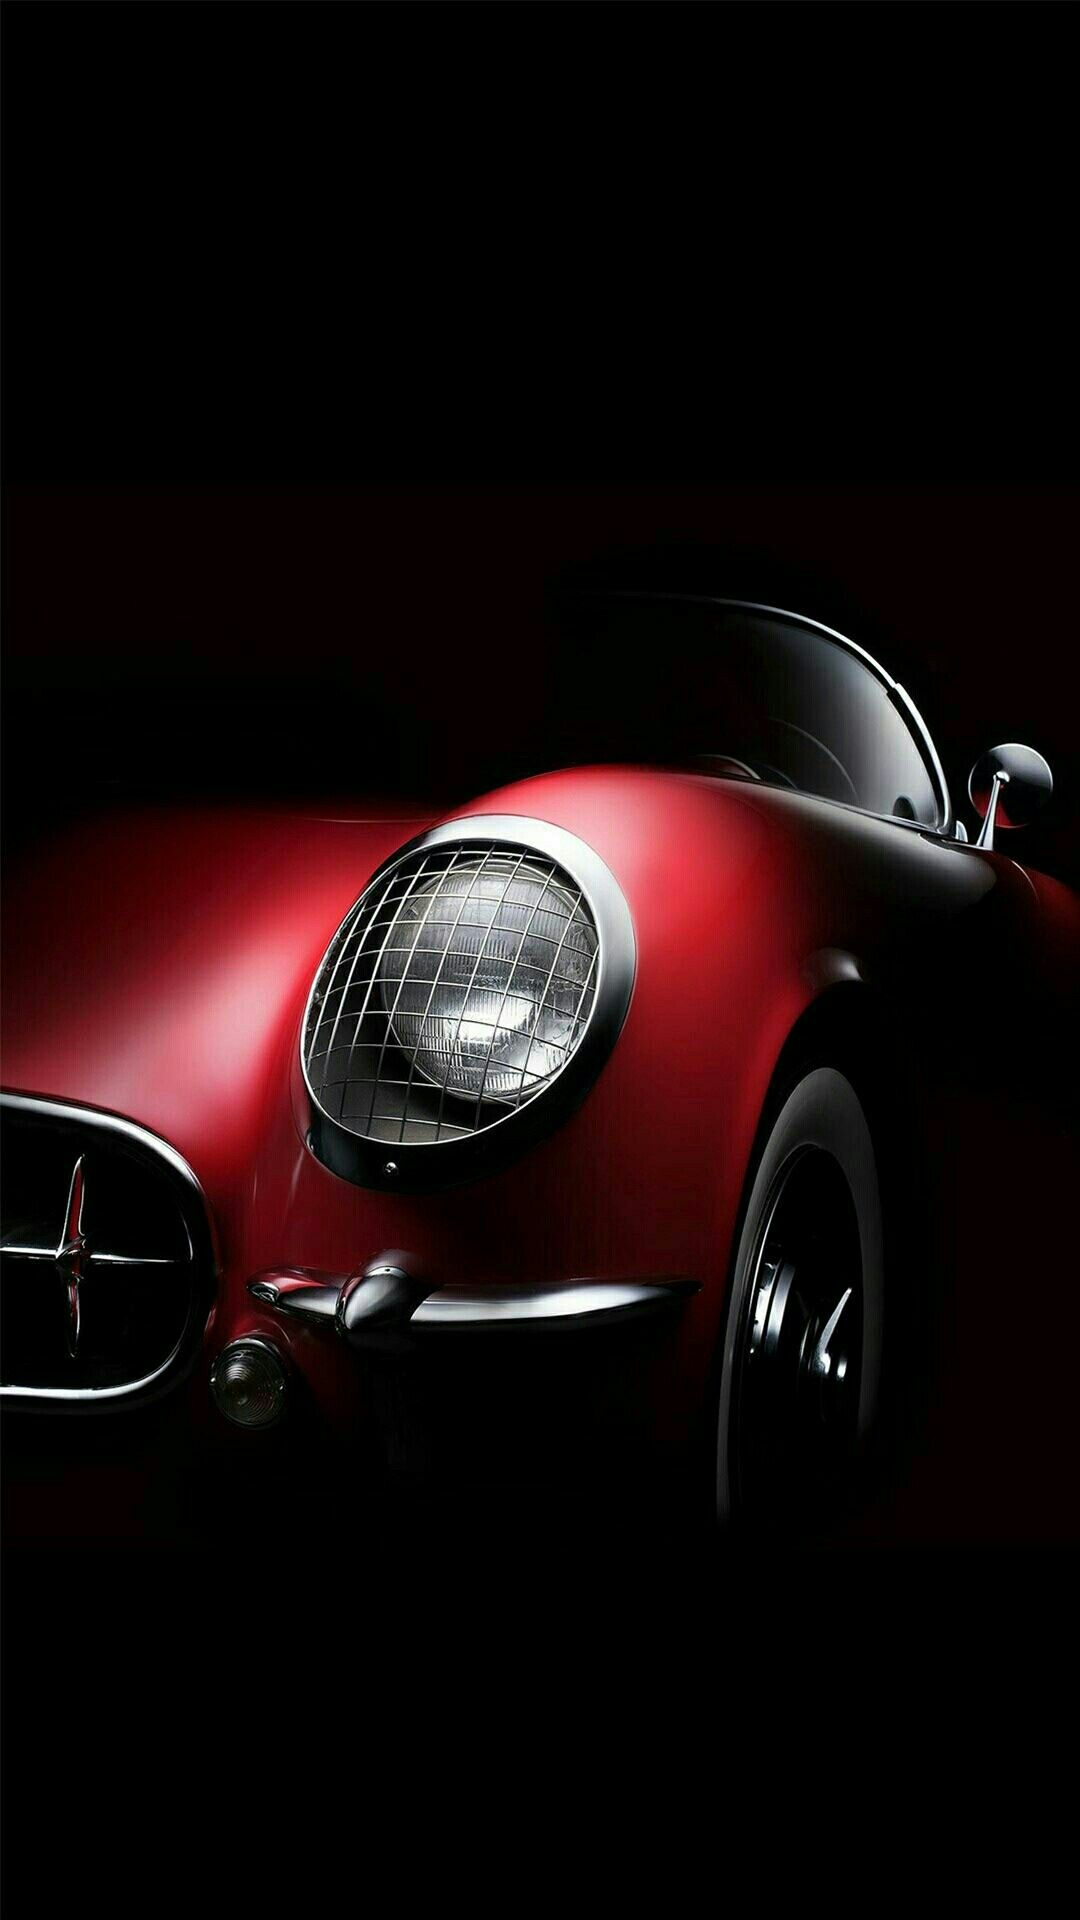 Classic Ferrari The Art Of Cruising Car Photography Automotive